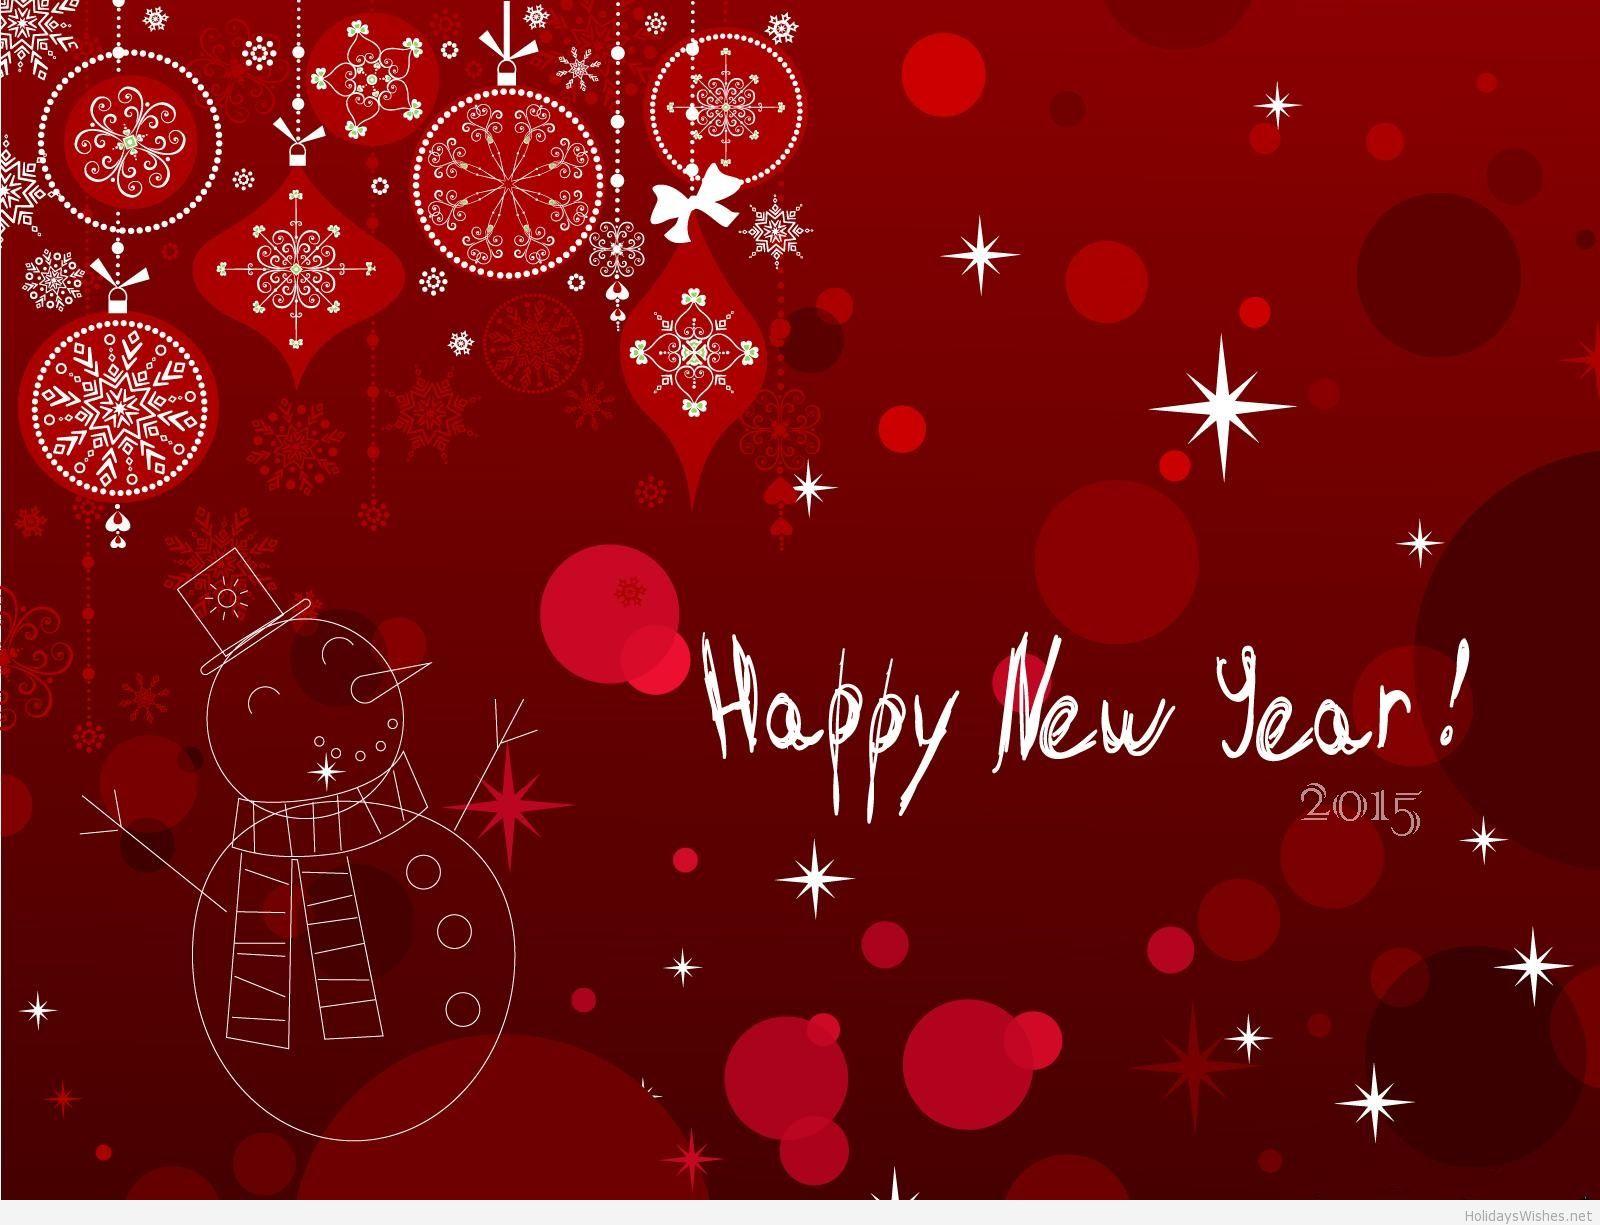 1600 x 1225 jpeg 201kB, Happy New Year 2015 Hd Image Com/page/2   New ...